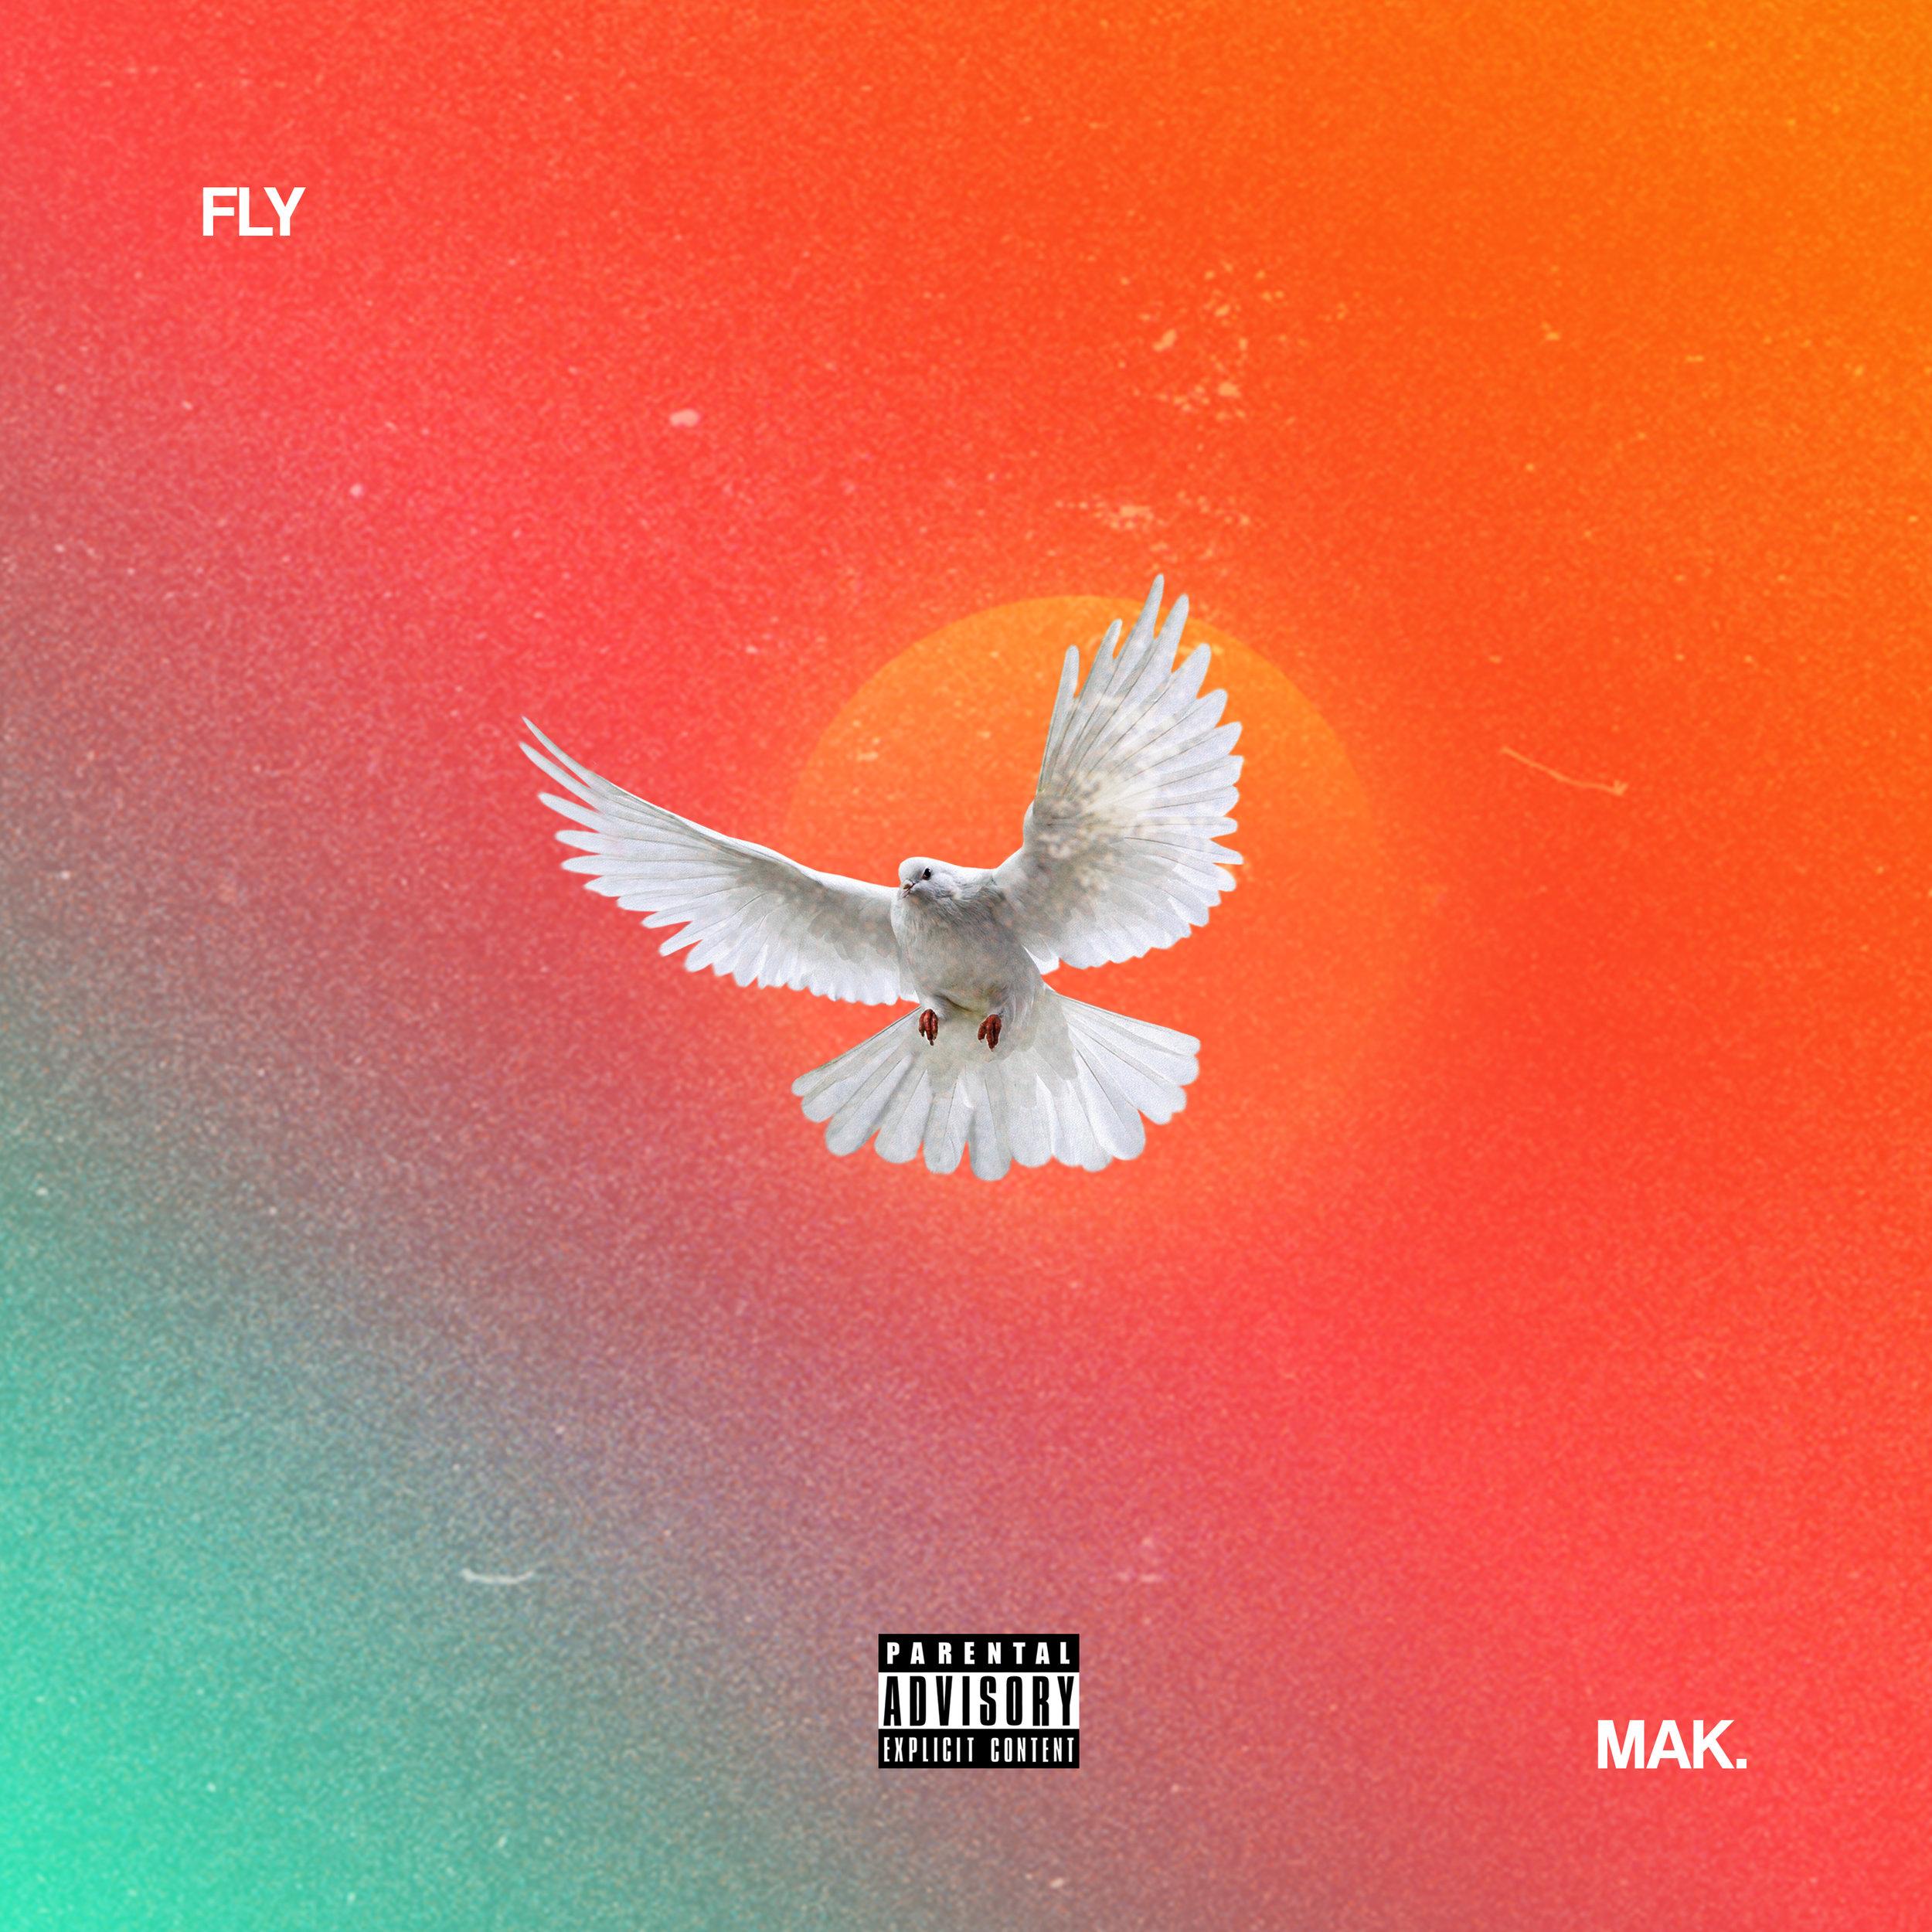 fly - Singly cover artwork for MAK.